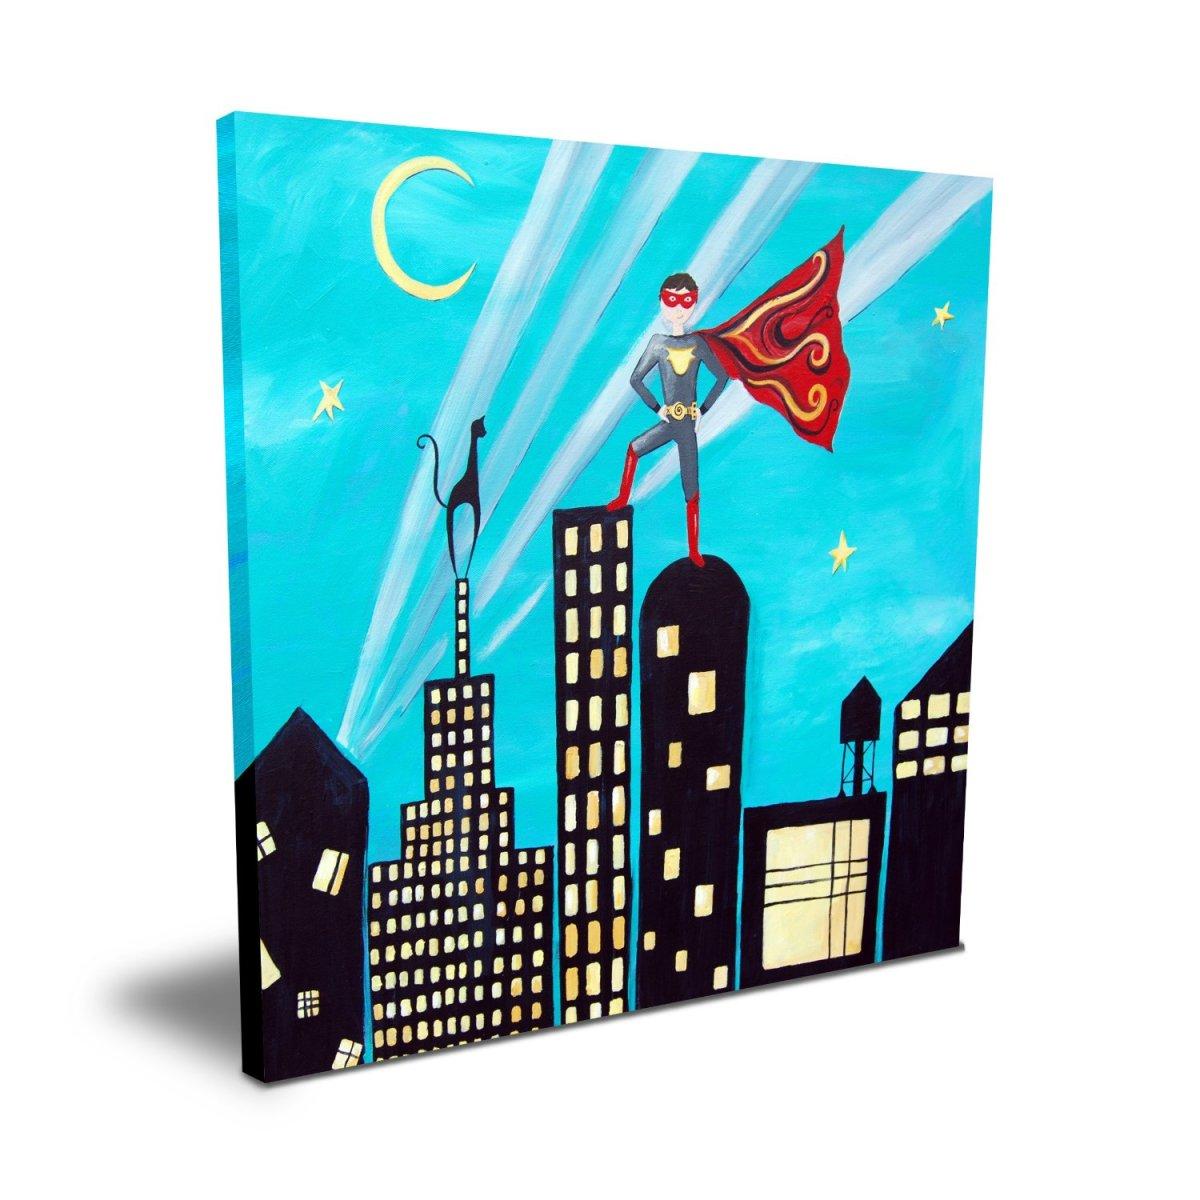 "Cici Art Factory 16"" x 16"" Superhero"